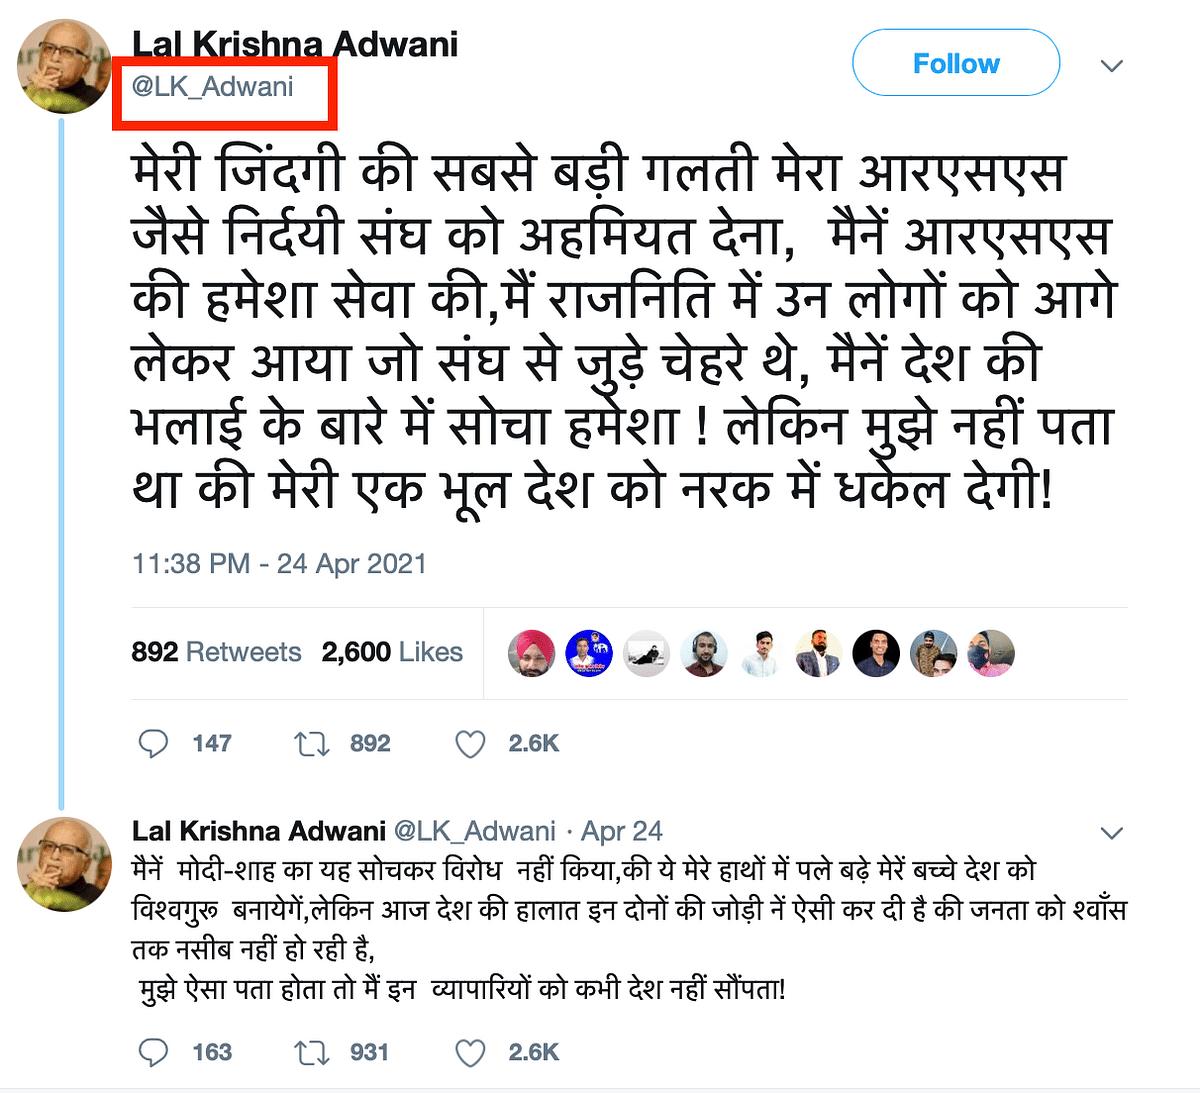 Imposter Account of Advani Criticises Modi Govt; Tweets Go Viral